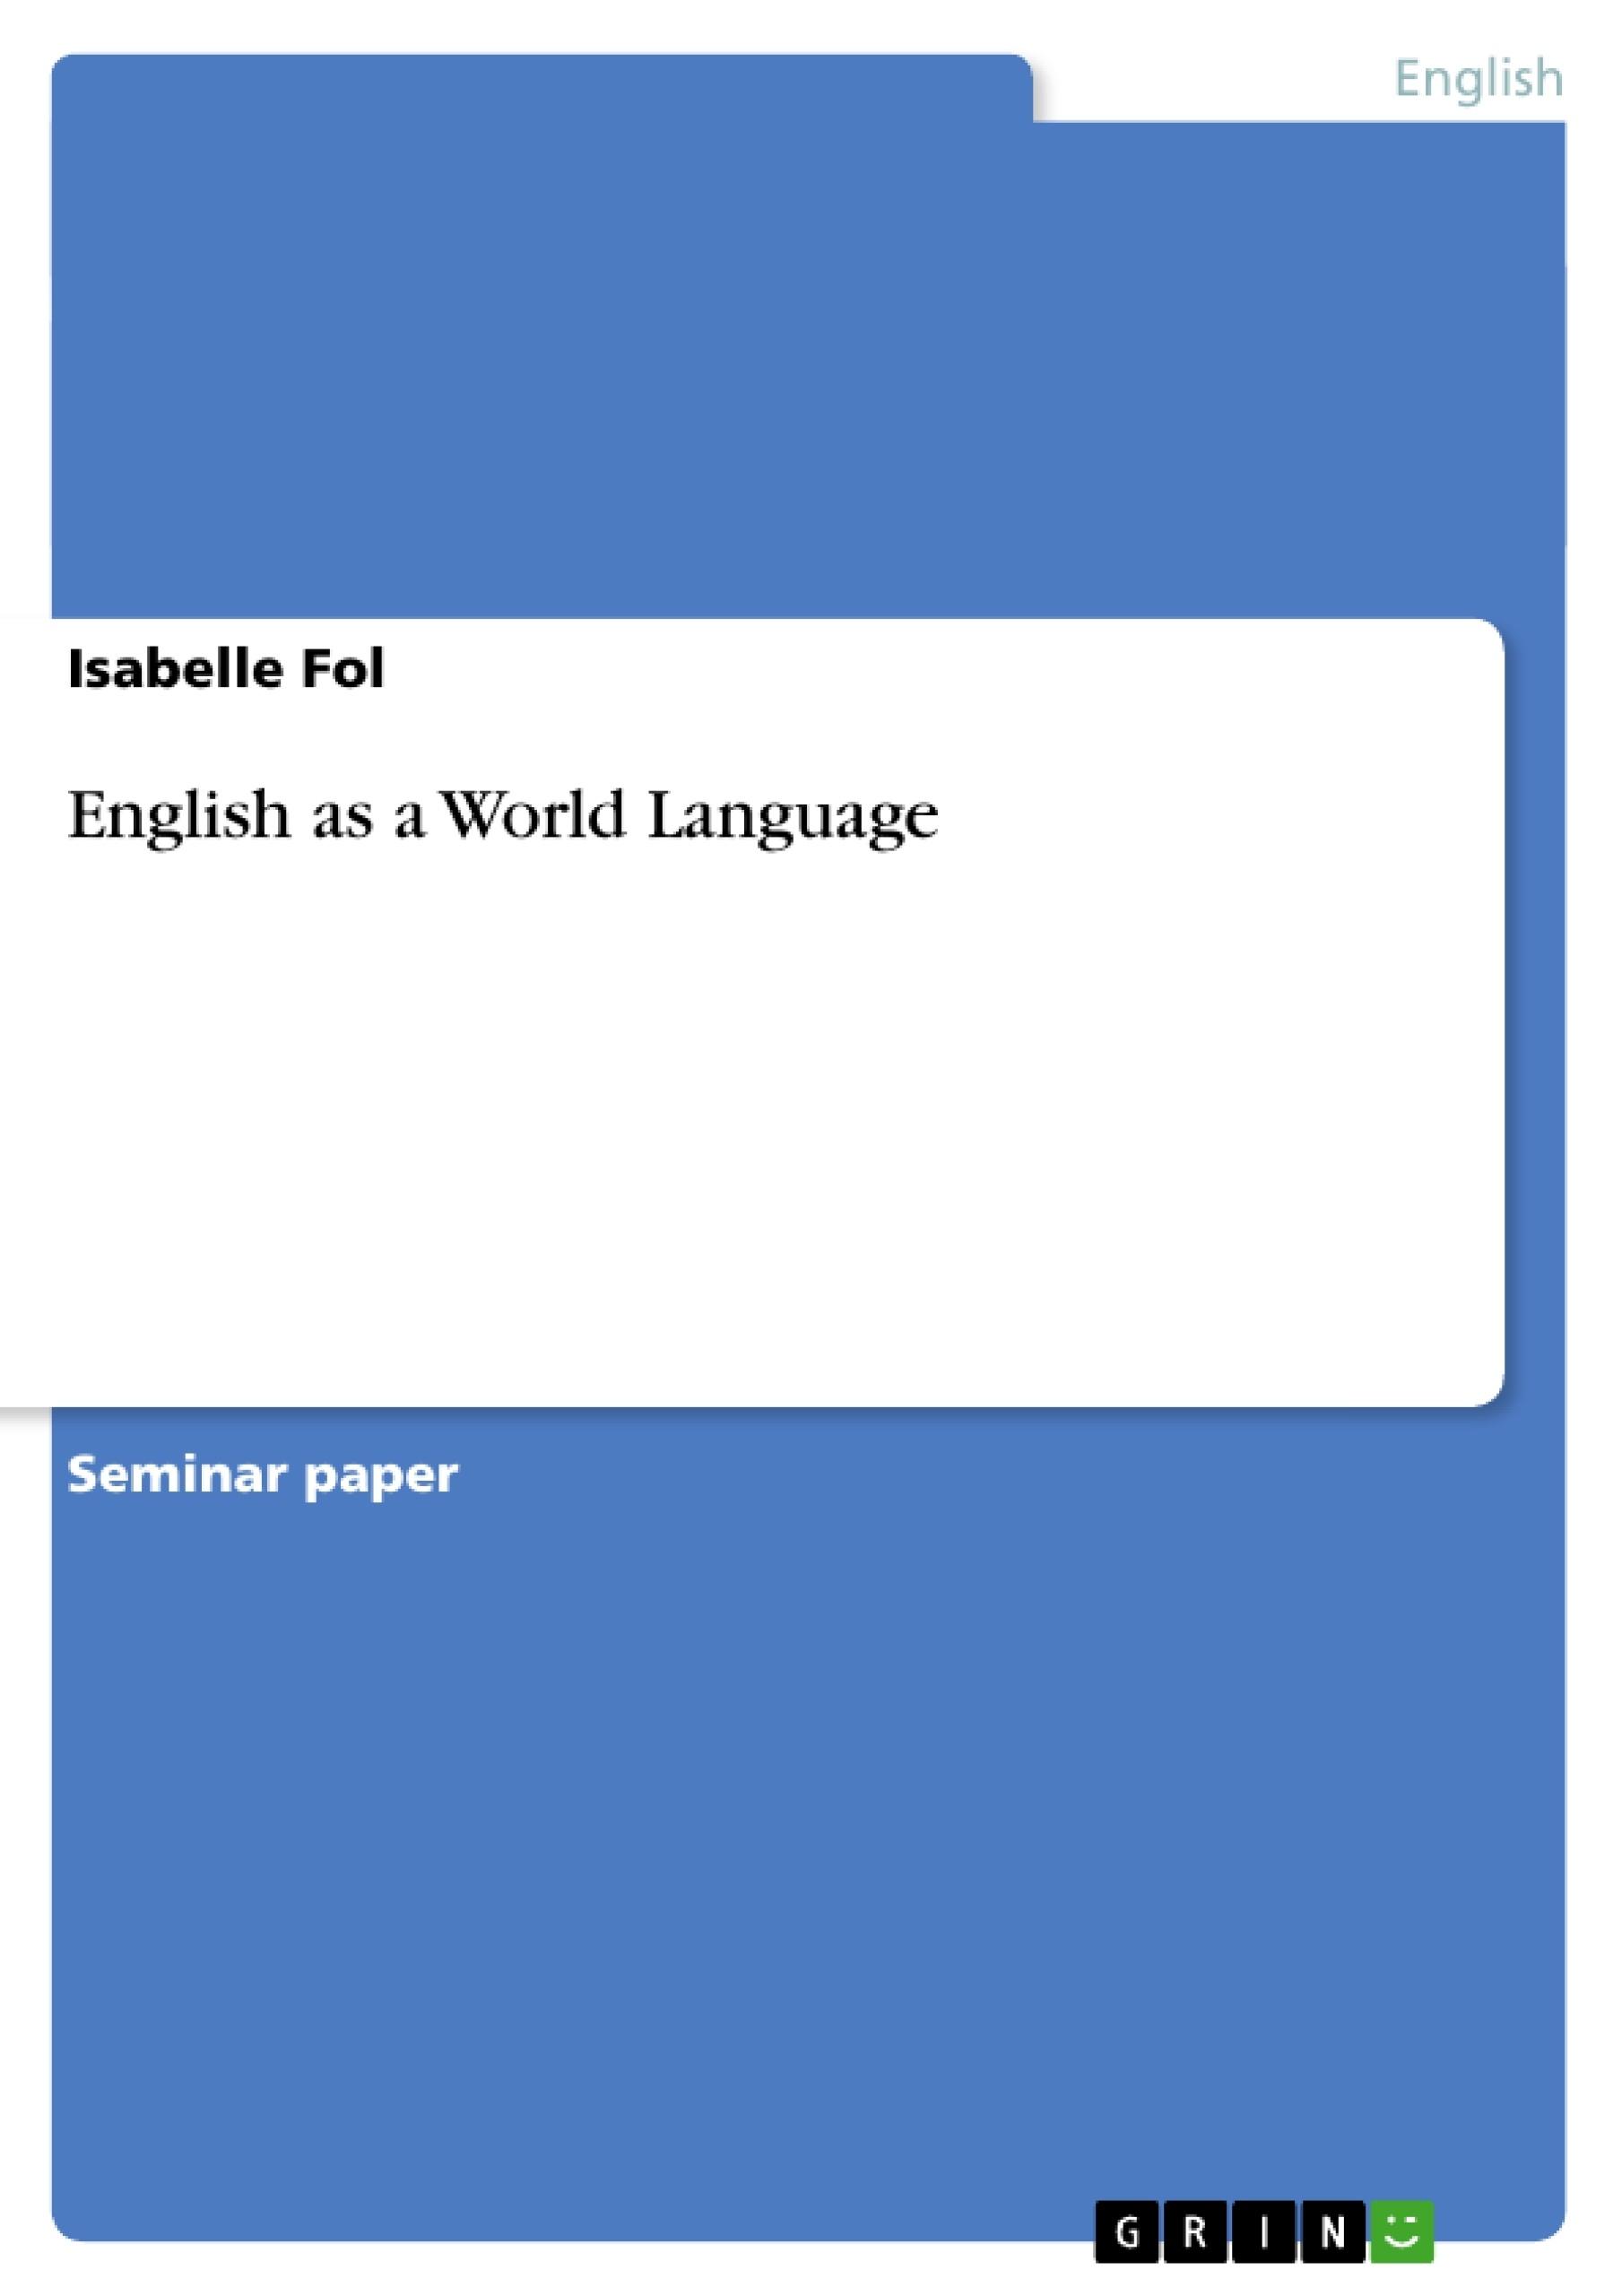 thesis english didactics